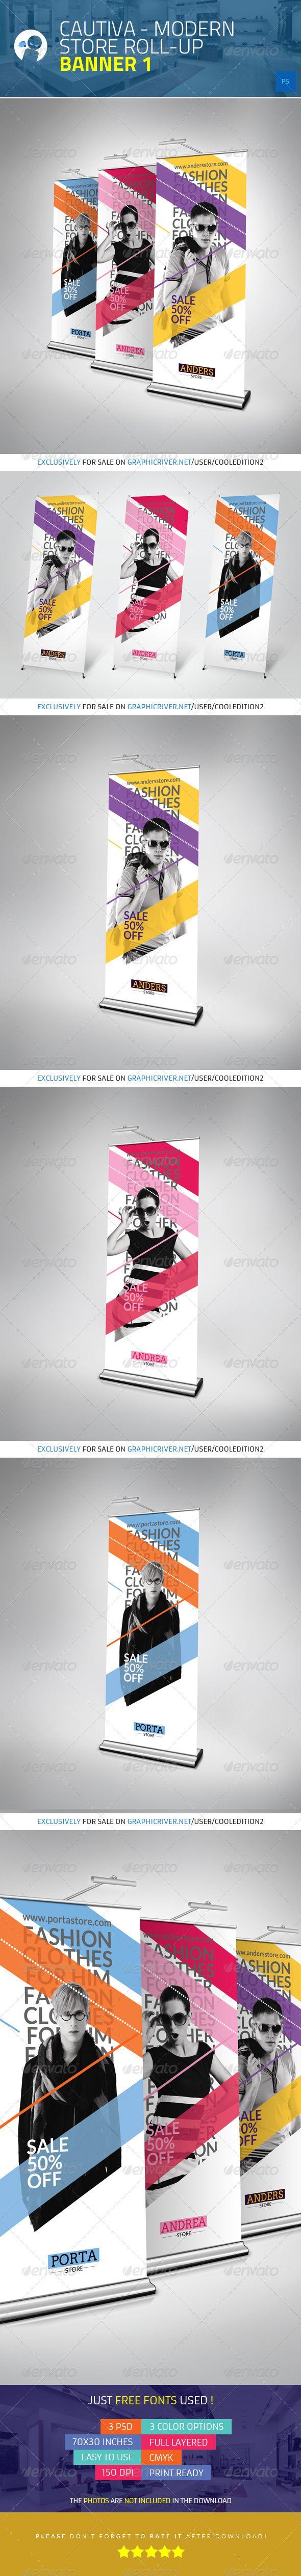 Cautiva - Modern Store - Roll Up Banner 1 - $6